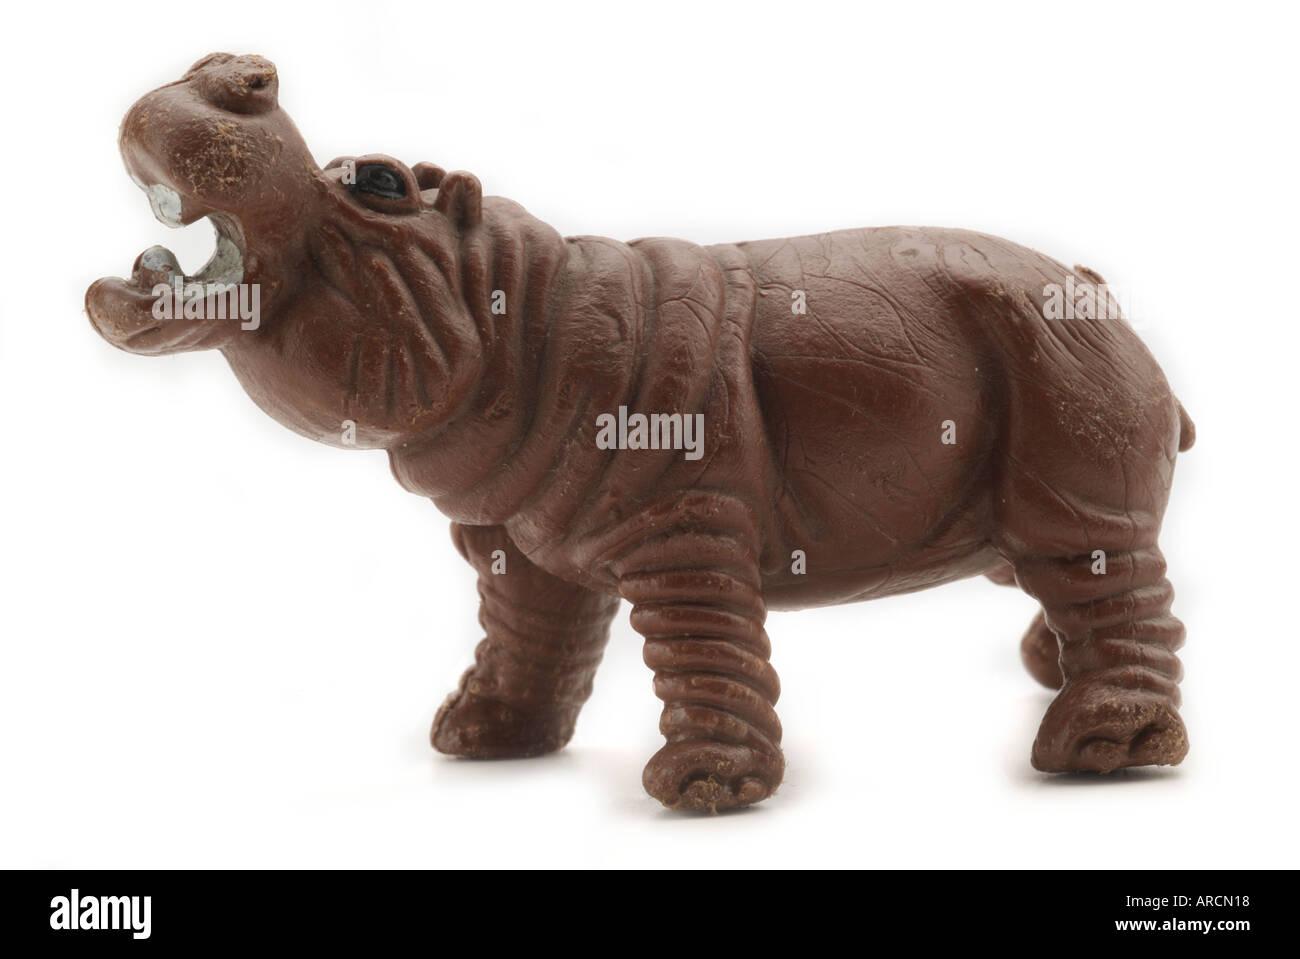 Hippo Hippopotamus Plastic Farm Zoo Animals Figure Cartoon England UK United Kingdom GB Great Britain EU